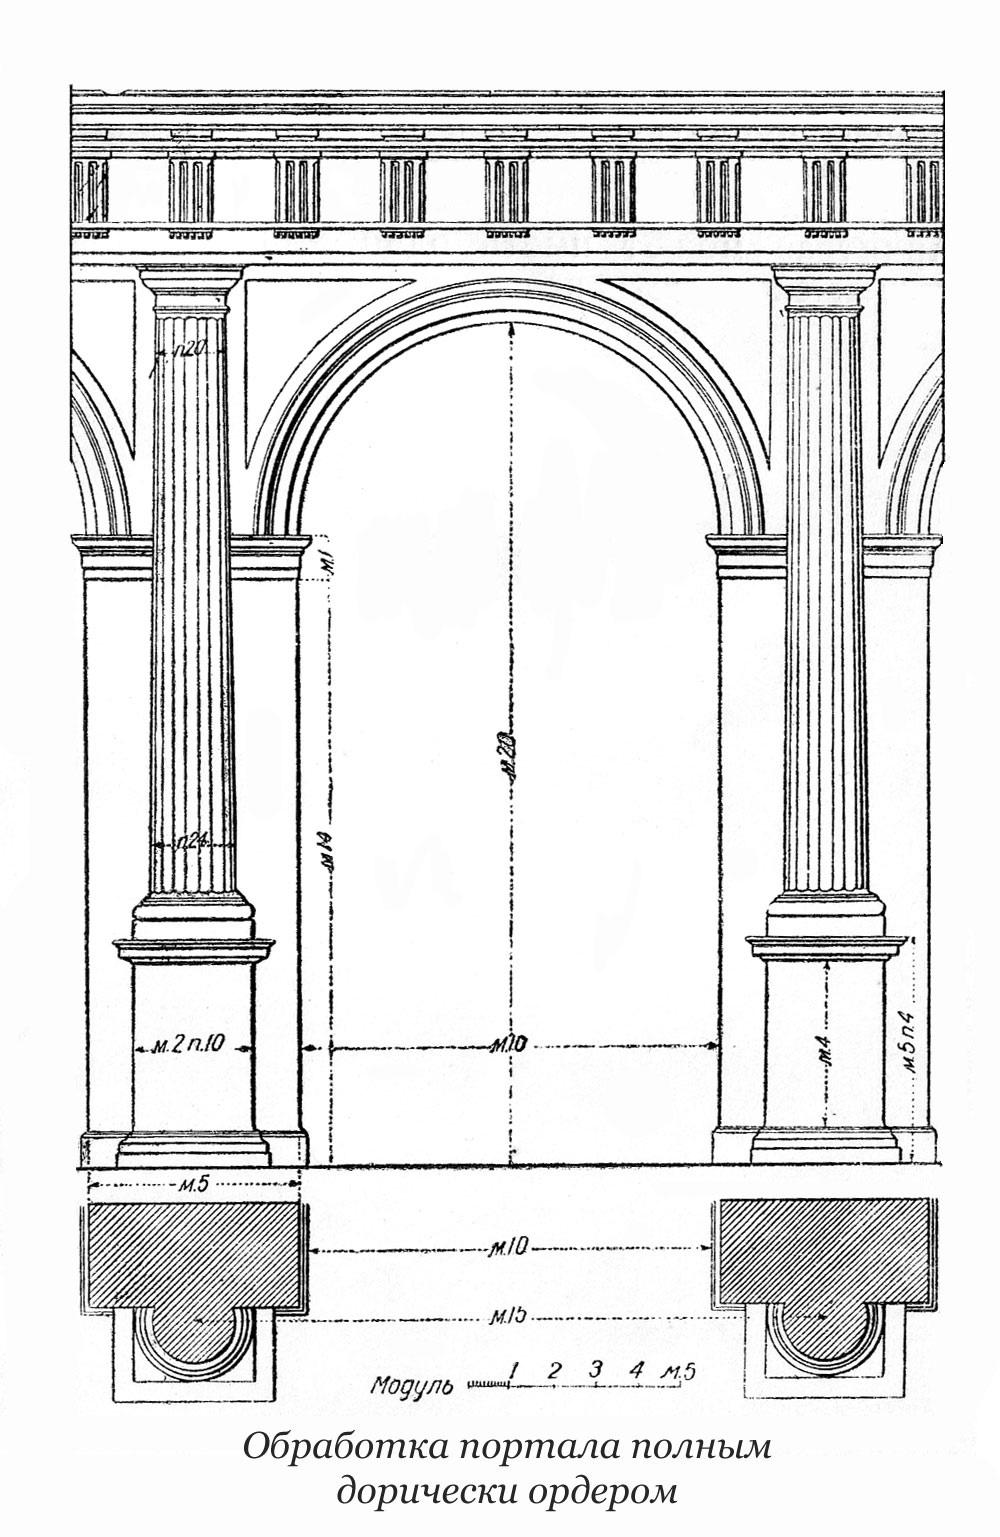 doric-order_colonnade-2